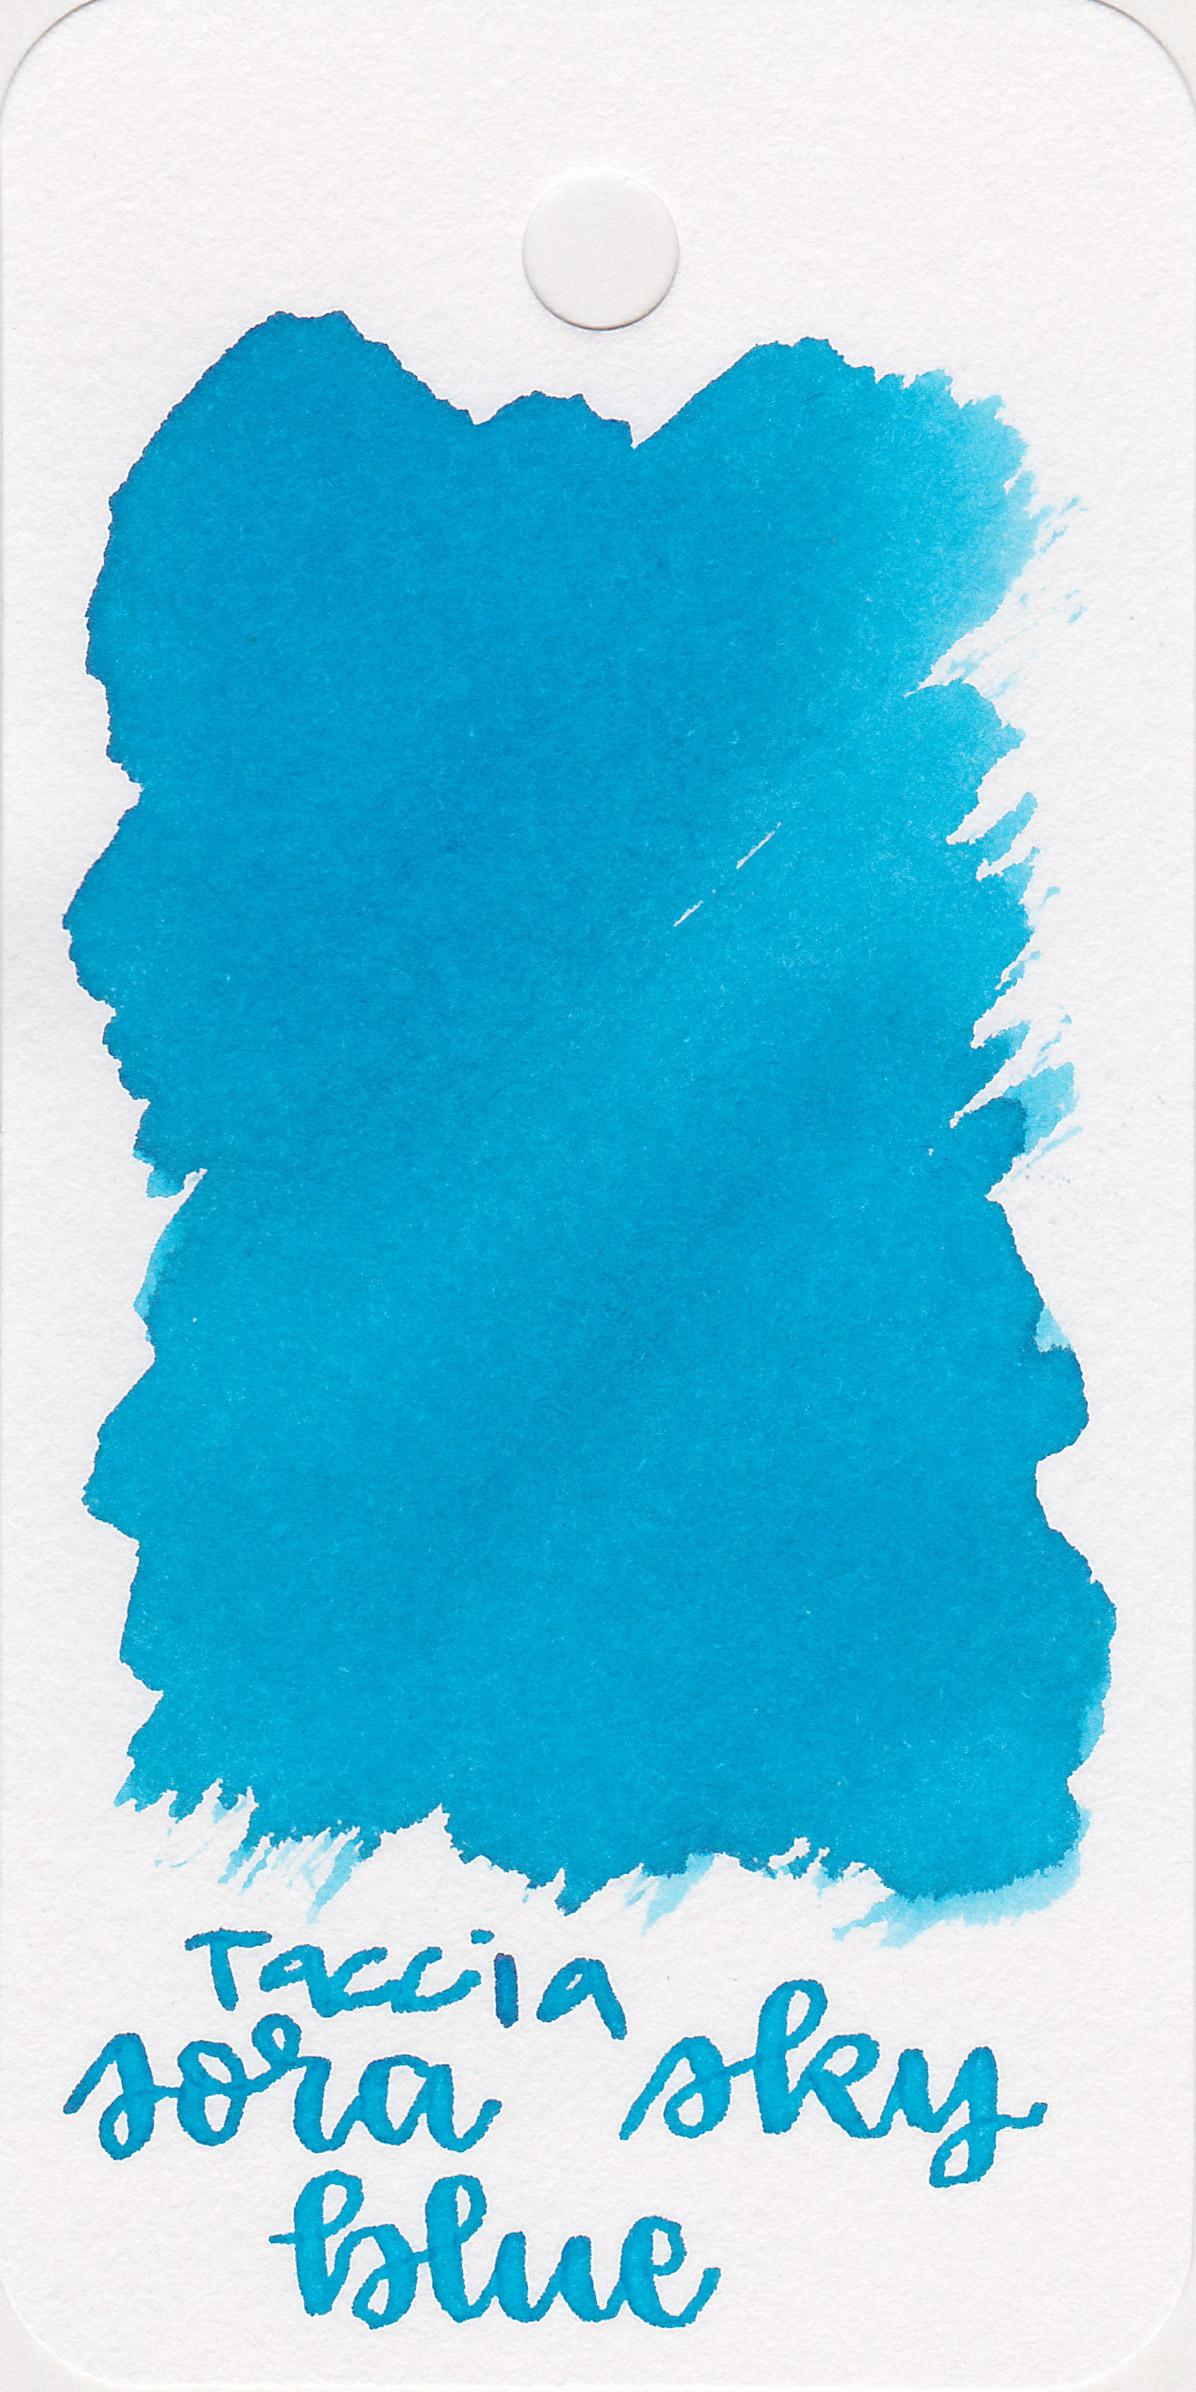 The color: - Sora Sky Blue is a bright light blue.